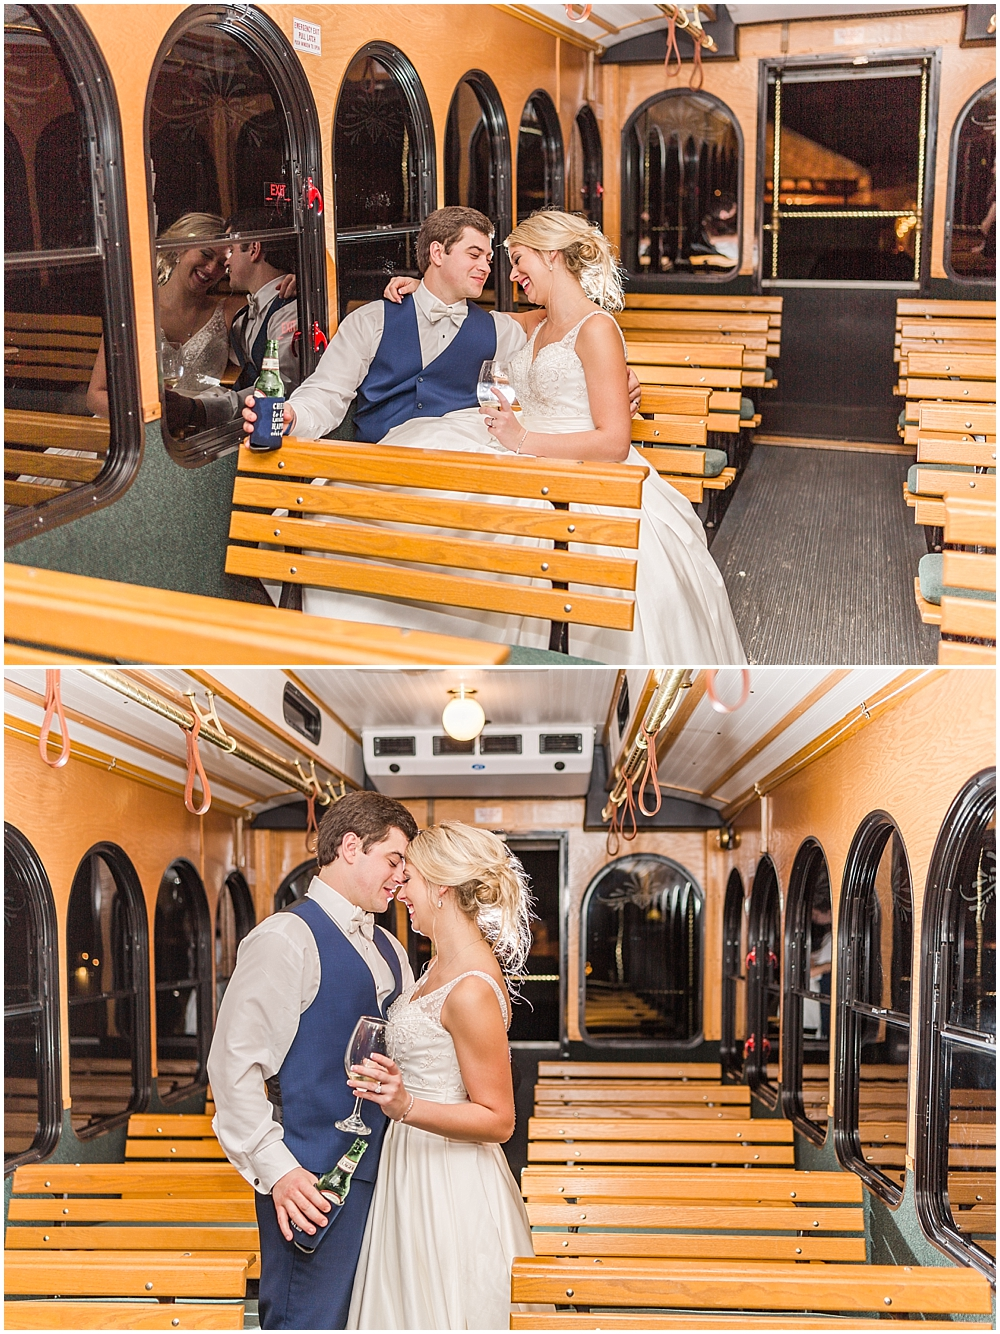 Ashton-Clark-Photography-Wedding-Portrait-Family-Photographer-Mobile-Alabama_0365.jpg